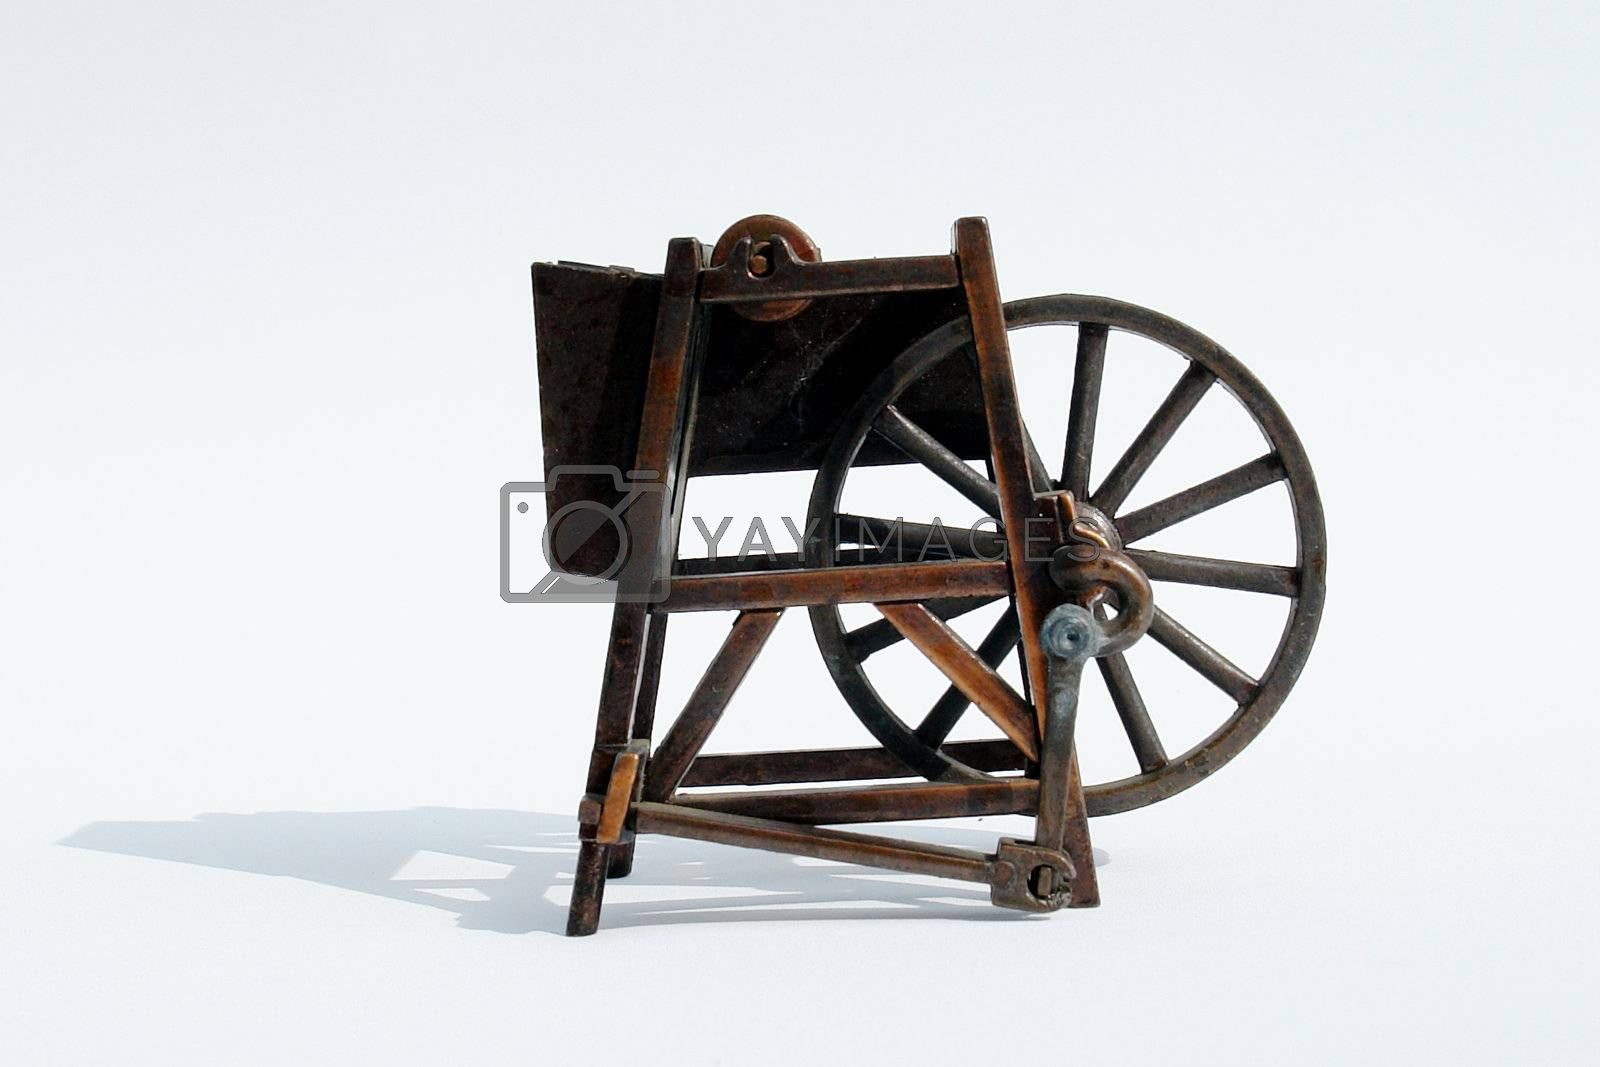 old bronze machine on white background, metal structure